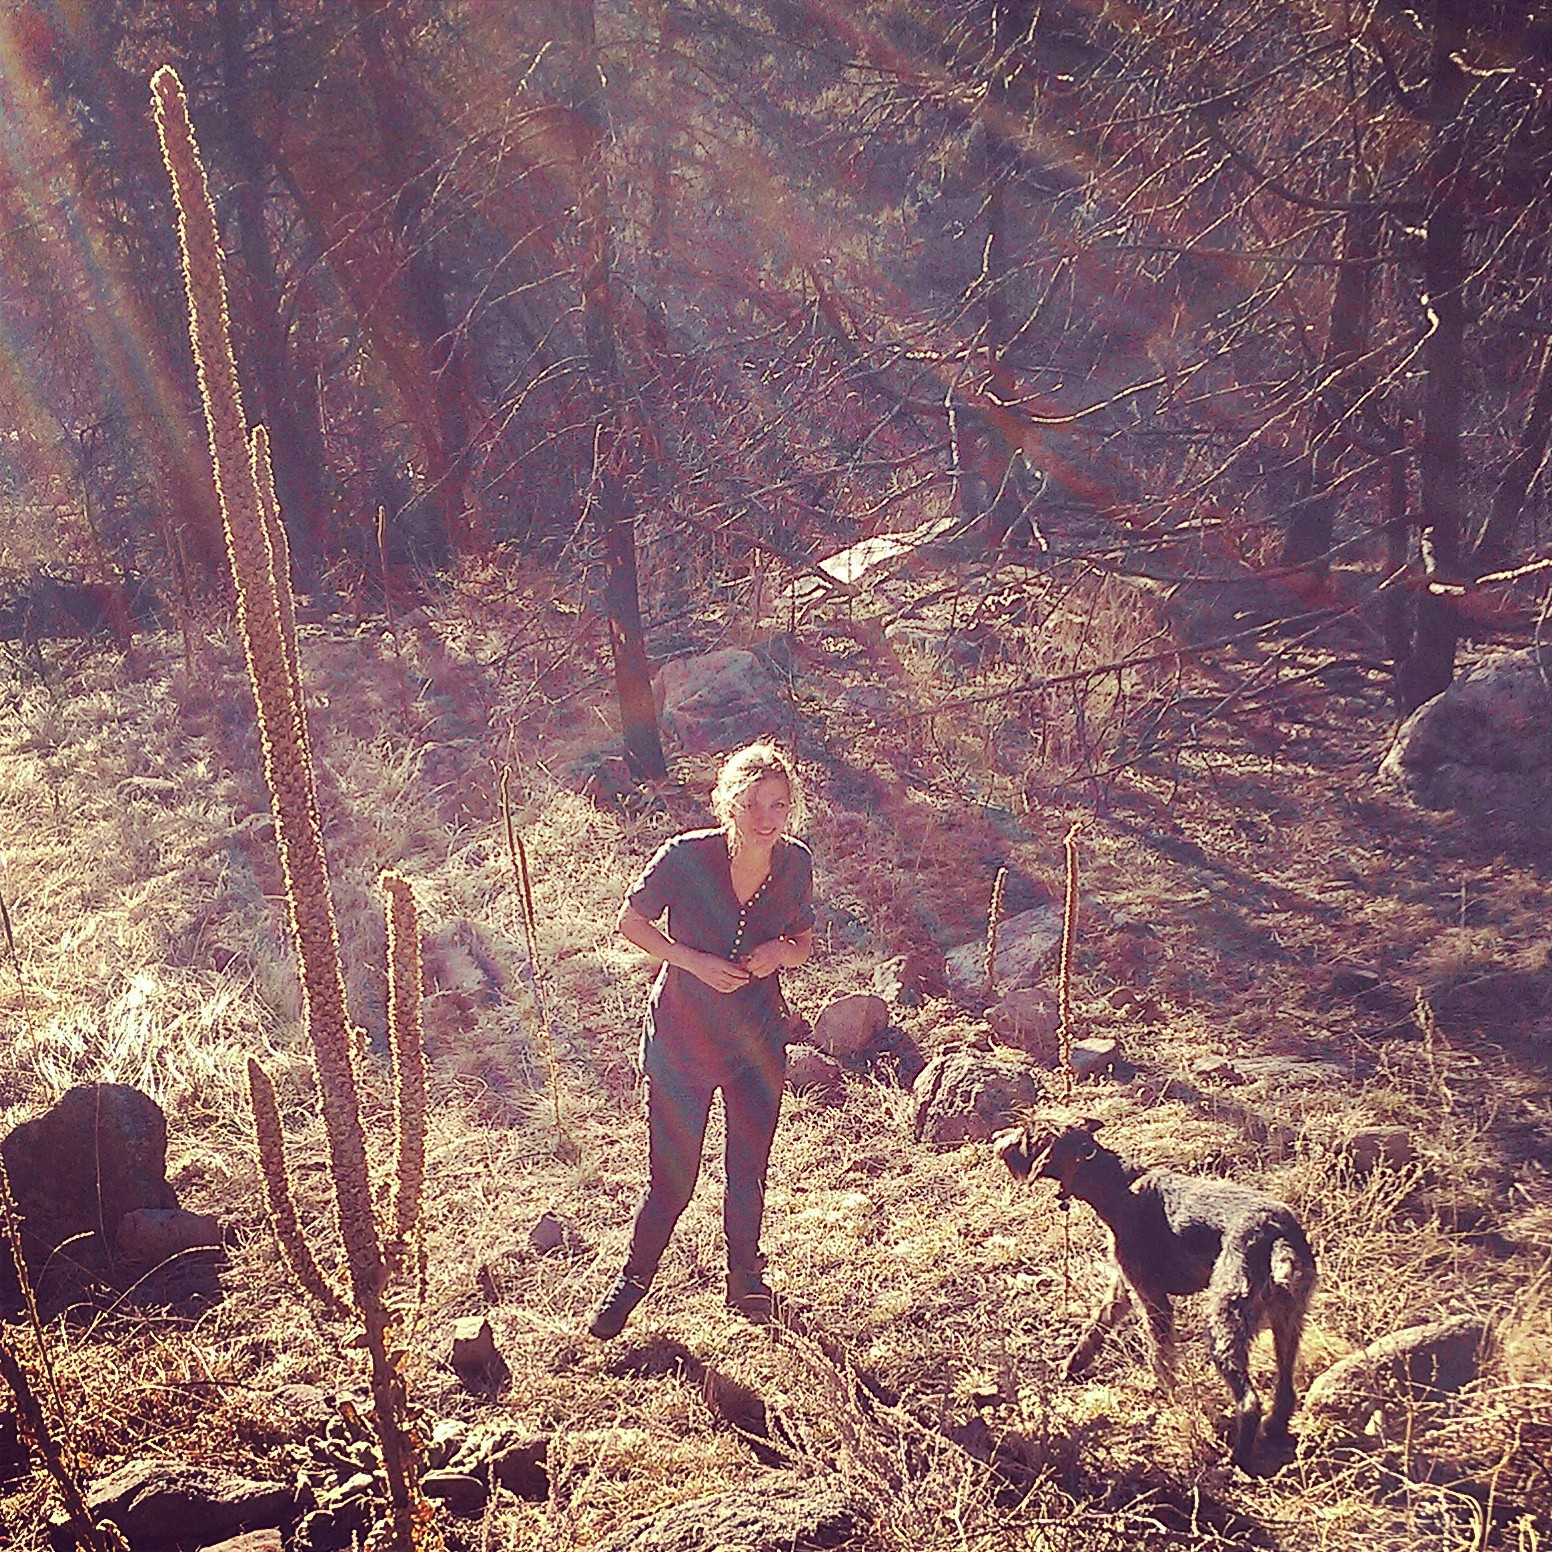 Women's Creative Health Coach | Lily Calfee + Ideal Nourishment | Women and Adventure